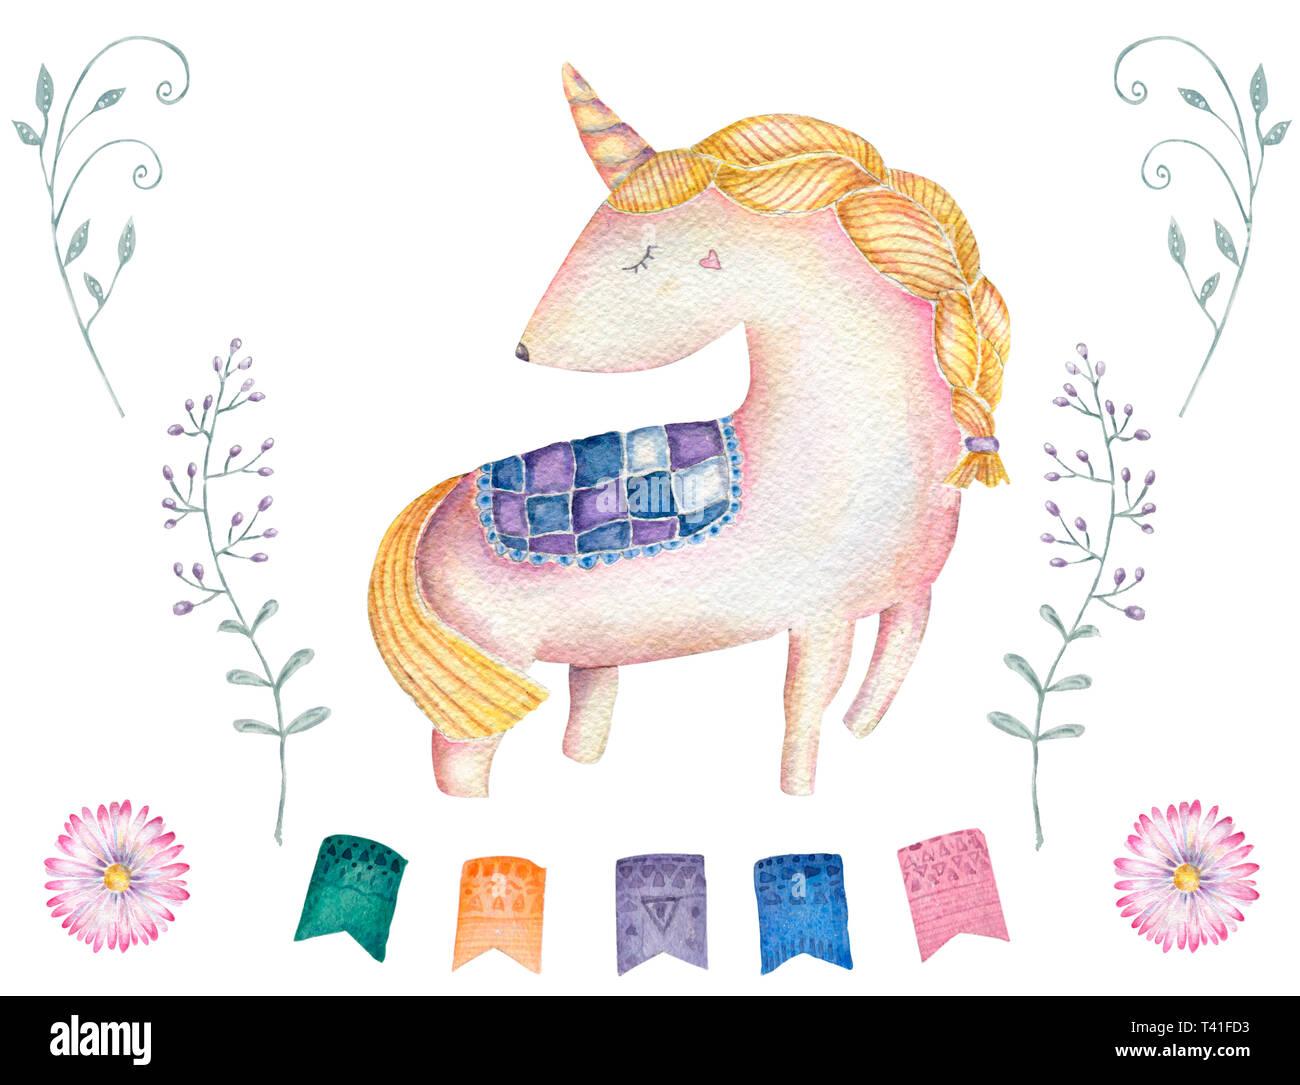 Unicorn Watercolor And Flower Pink Unicorn Beautiful Animal Cute Pony Little Horse Clip Art Drawing Magic Illustration Fantasy Birthday Greeting Card Stock Photo Alamy